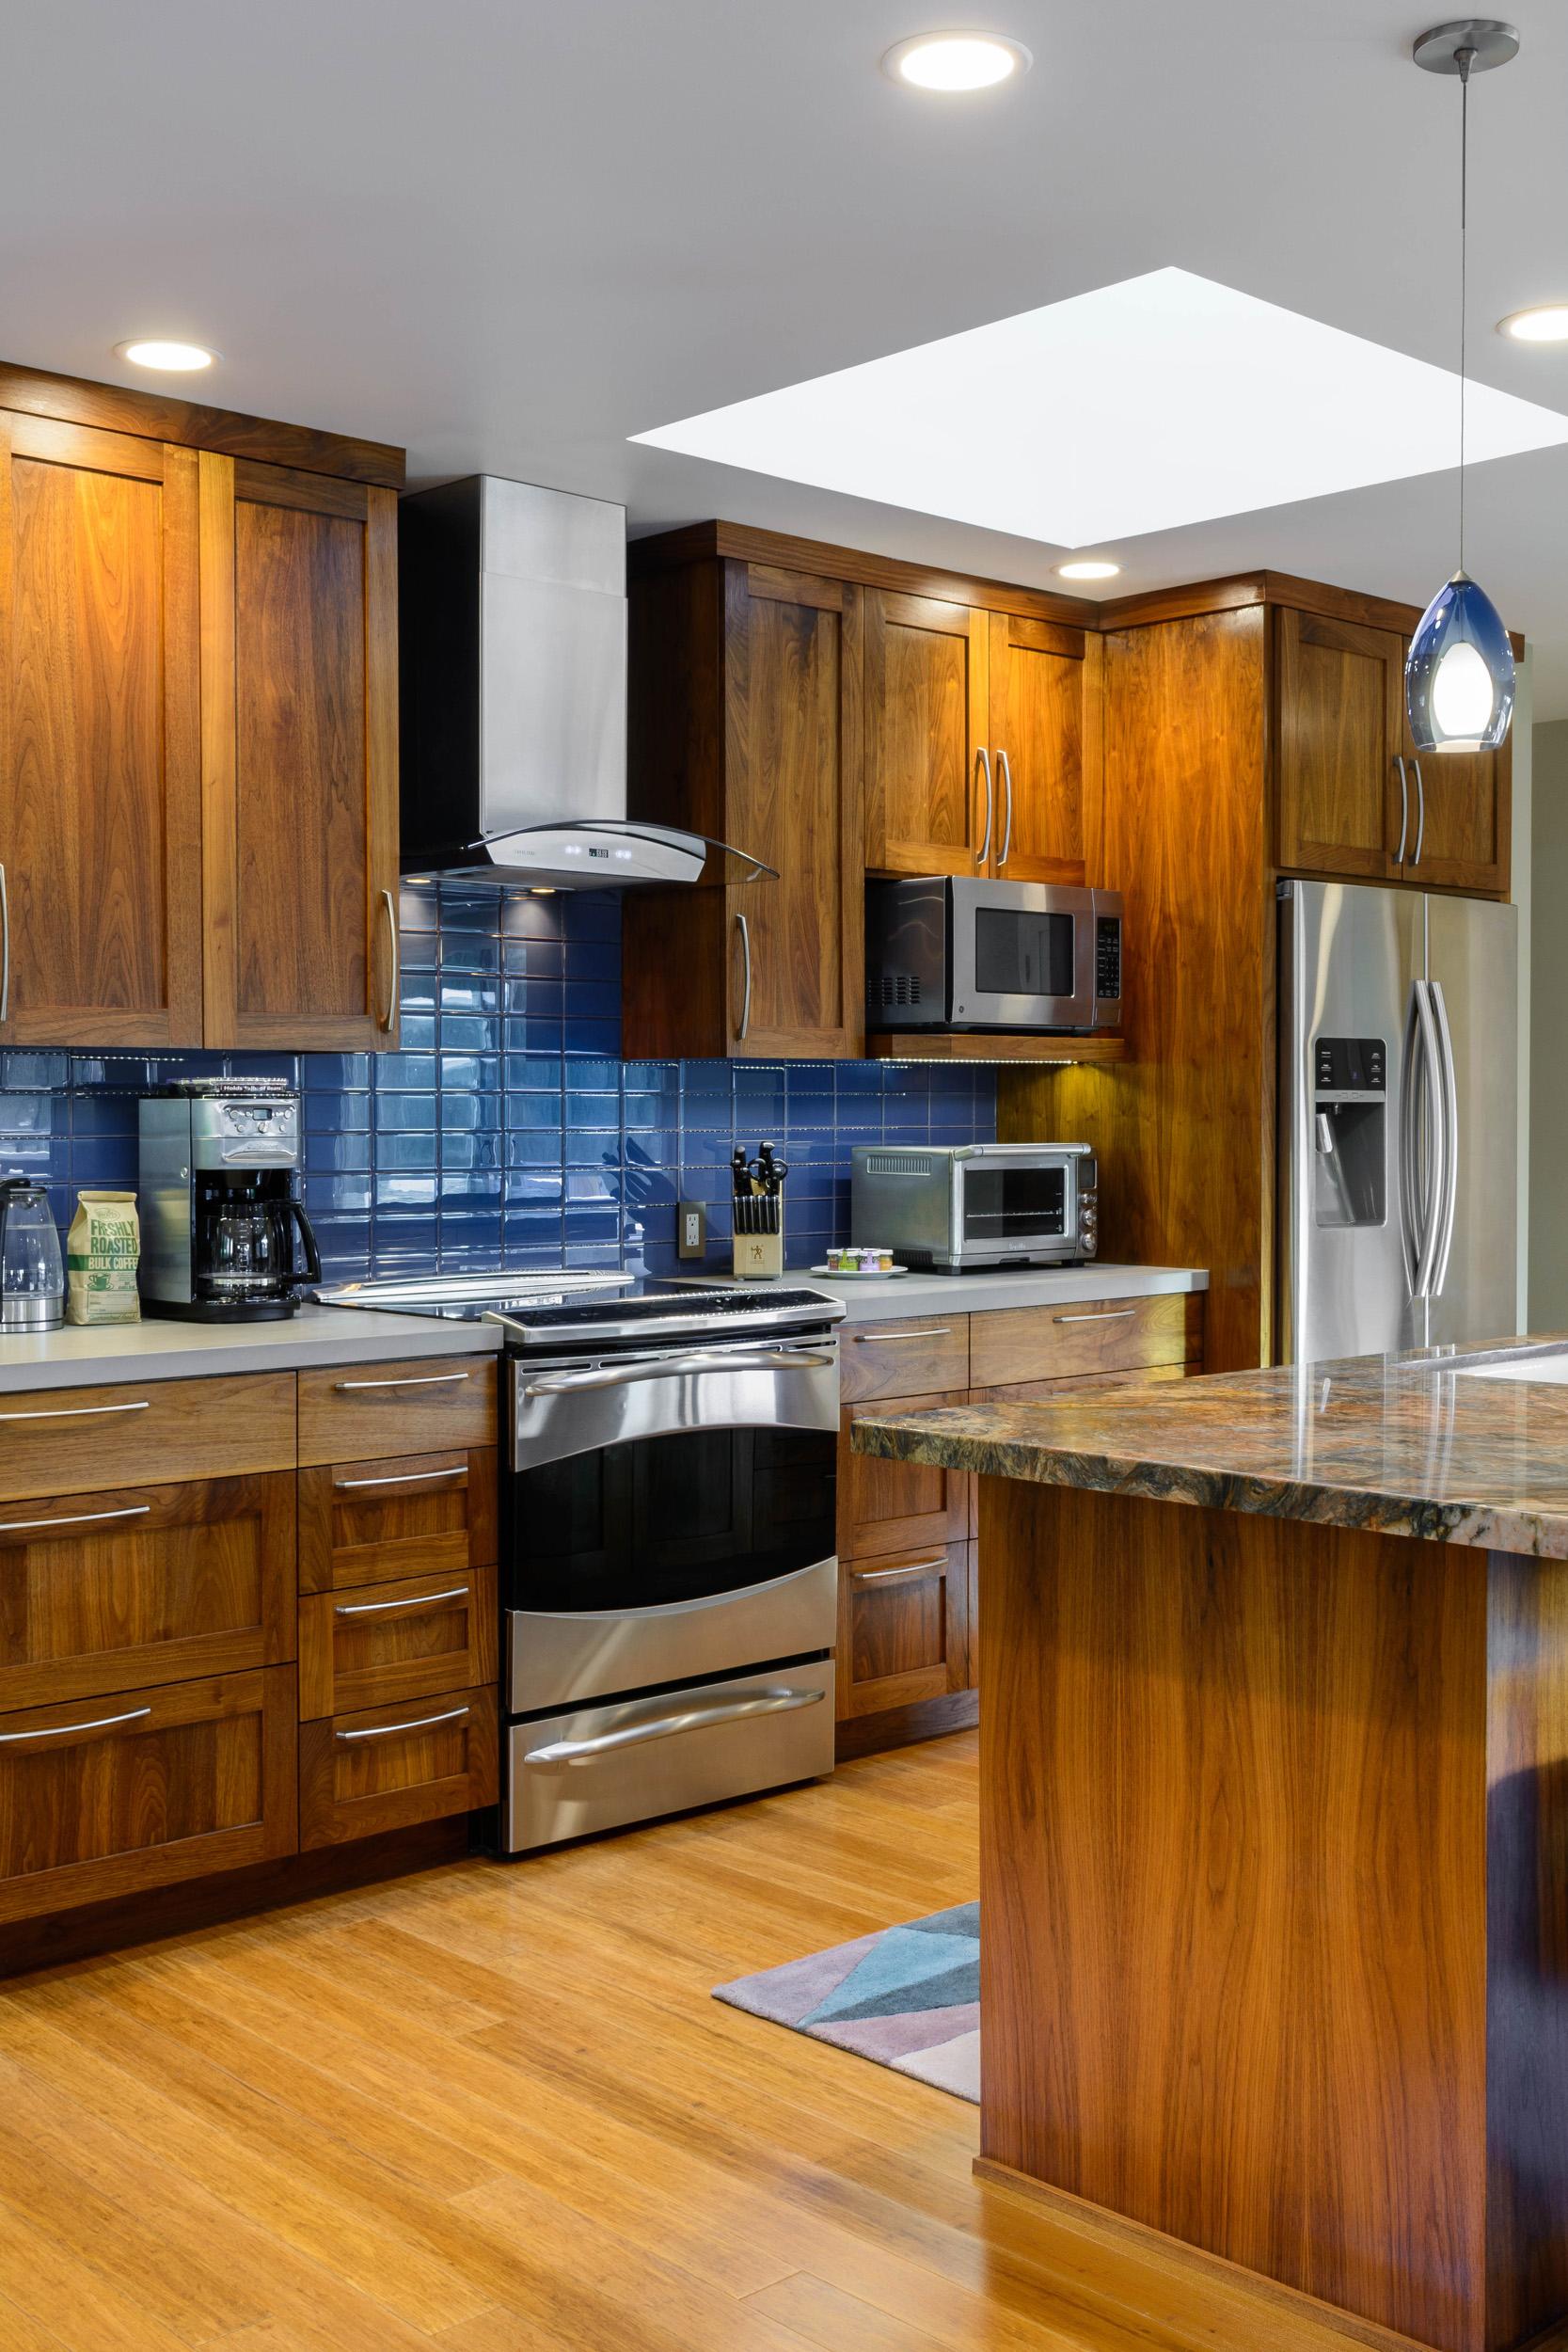 Contemporary kitchen lighting: skylights, pendants lights, LED recessed lighting and under cabinet lighting